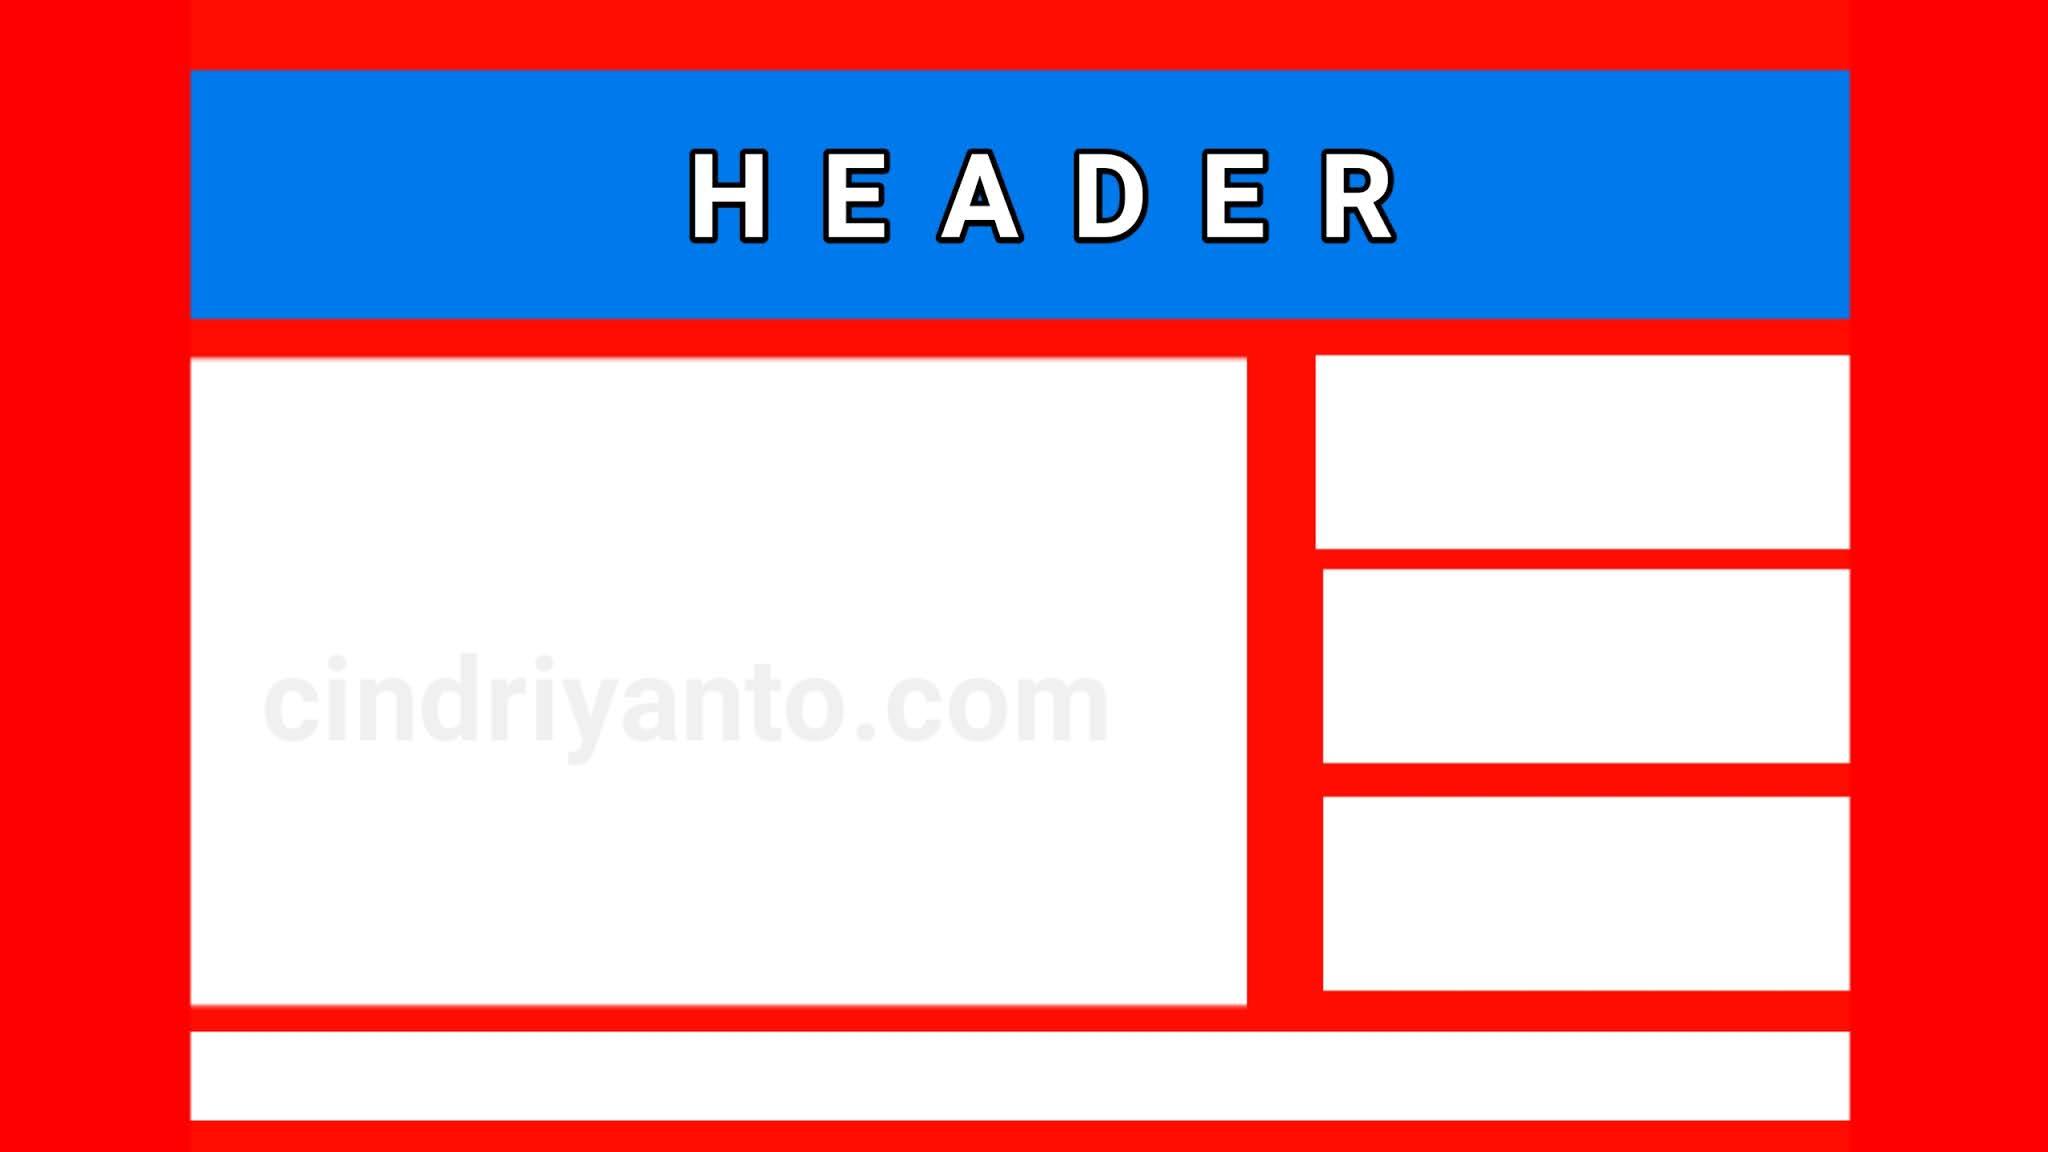 Cara membuat logo untuk header blogger